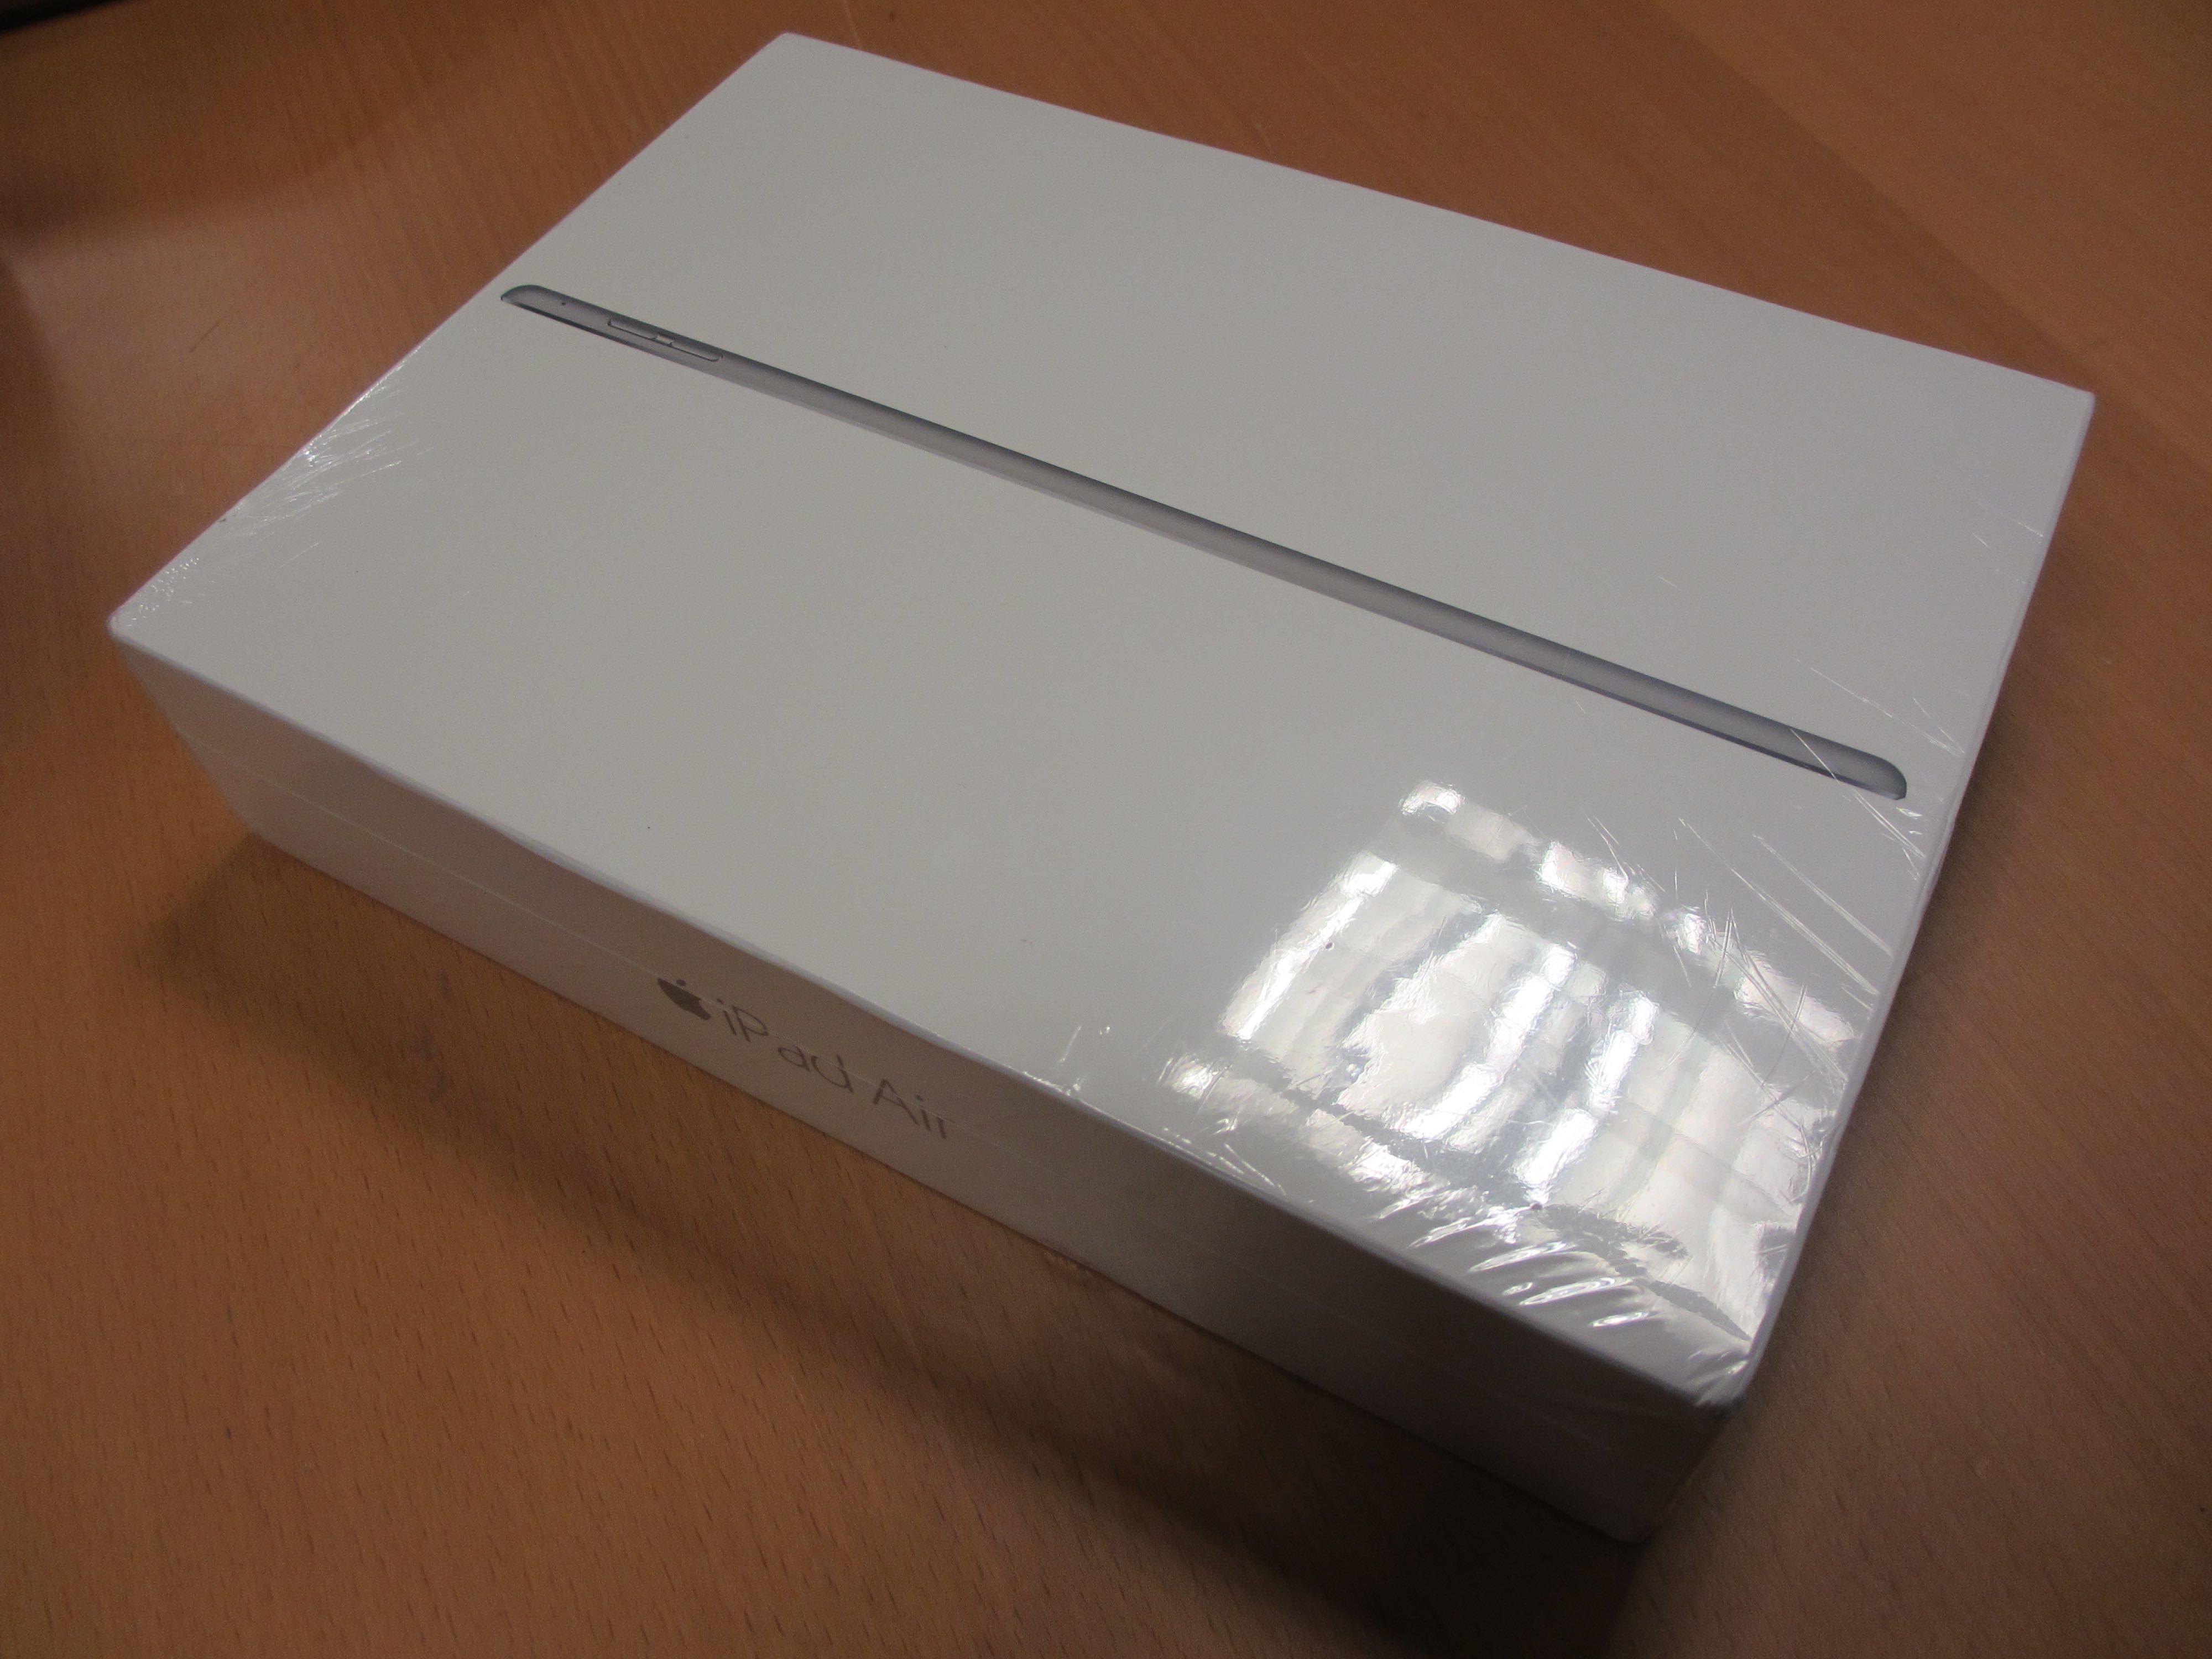 Ipad Air 2 Box Contents Ipad Air 2 Wi-fi 16gb Space